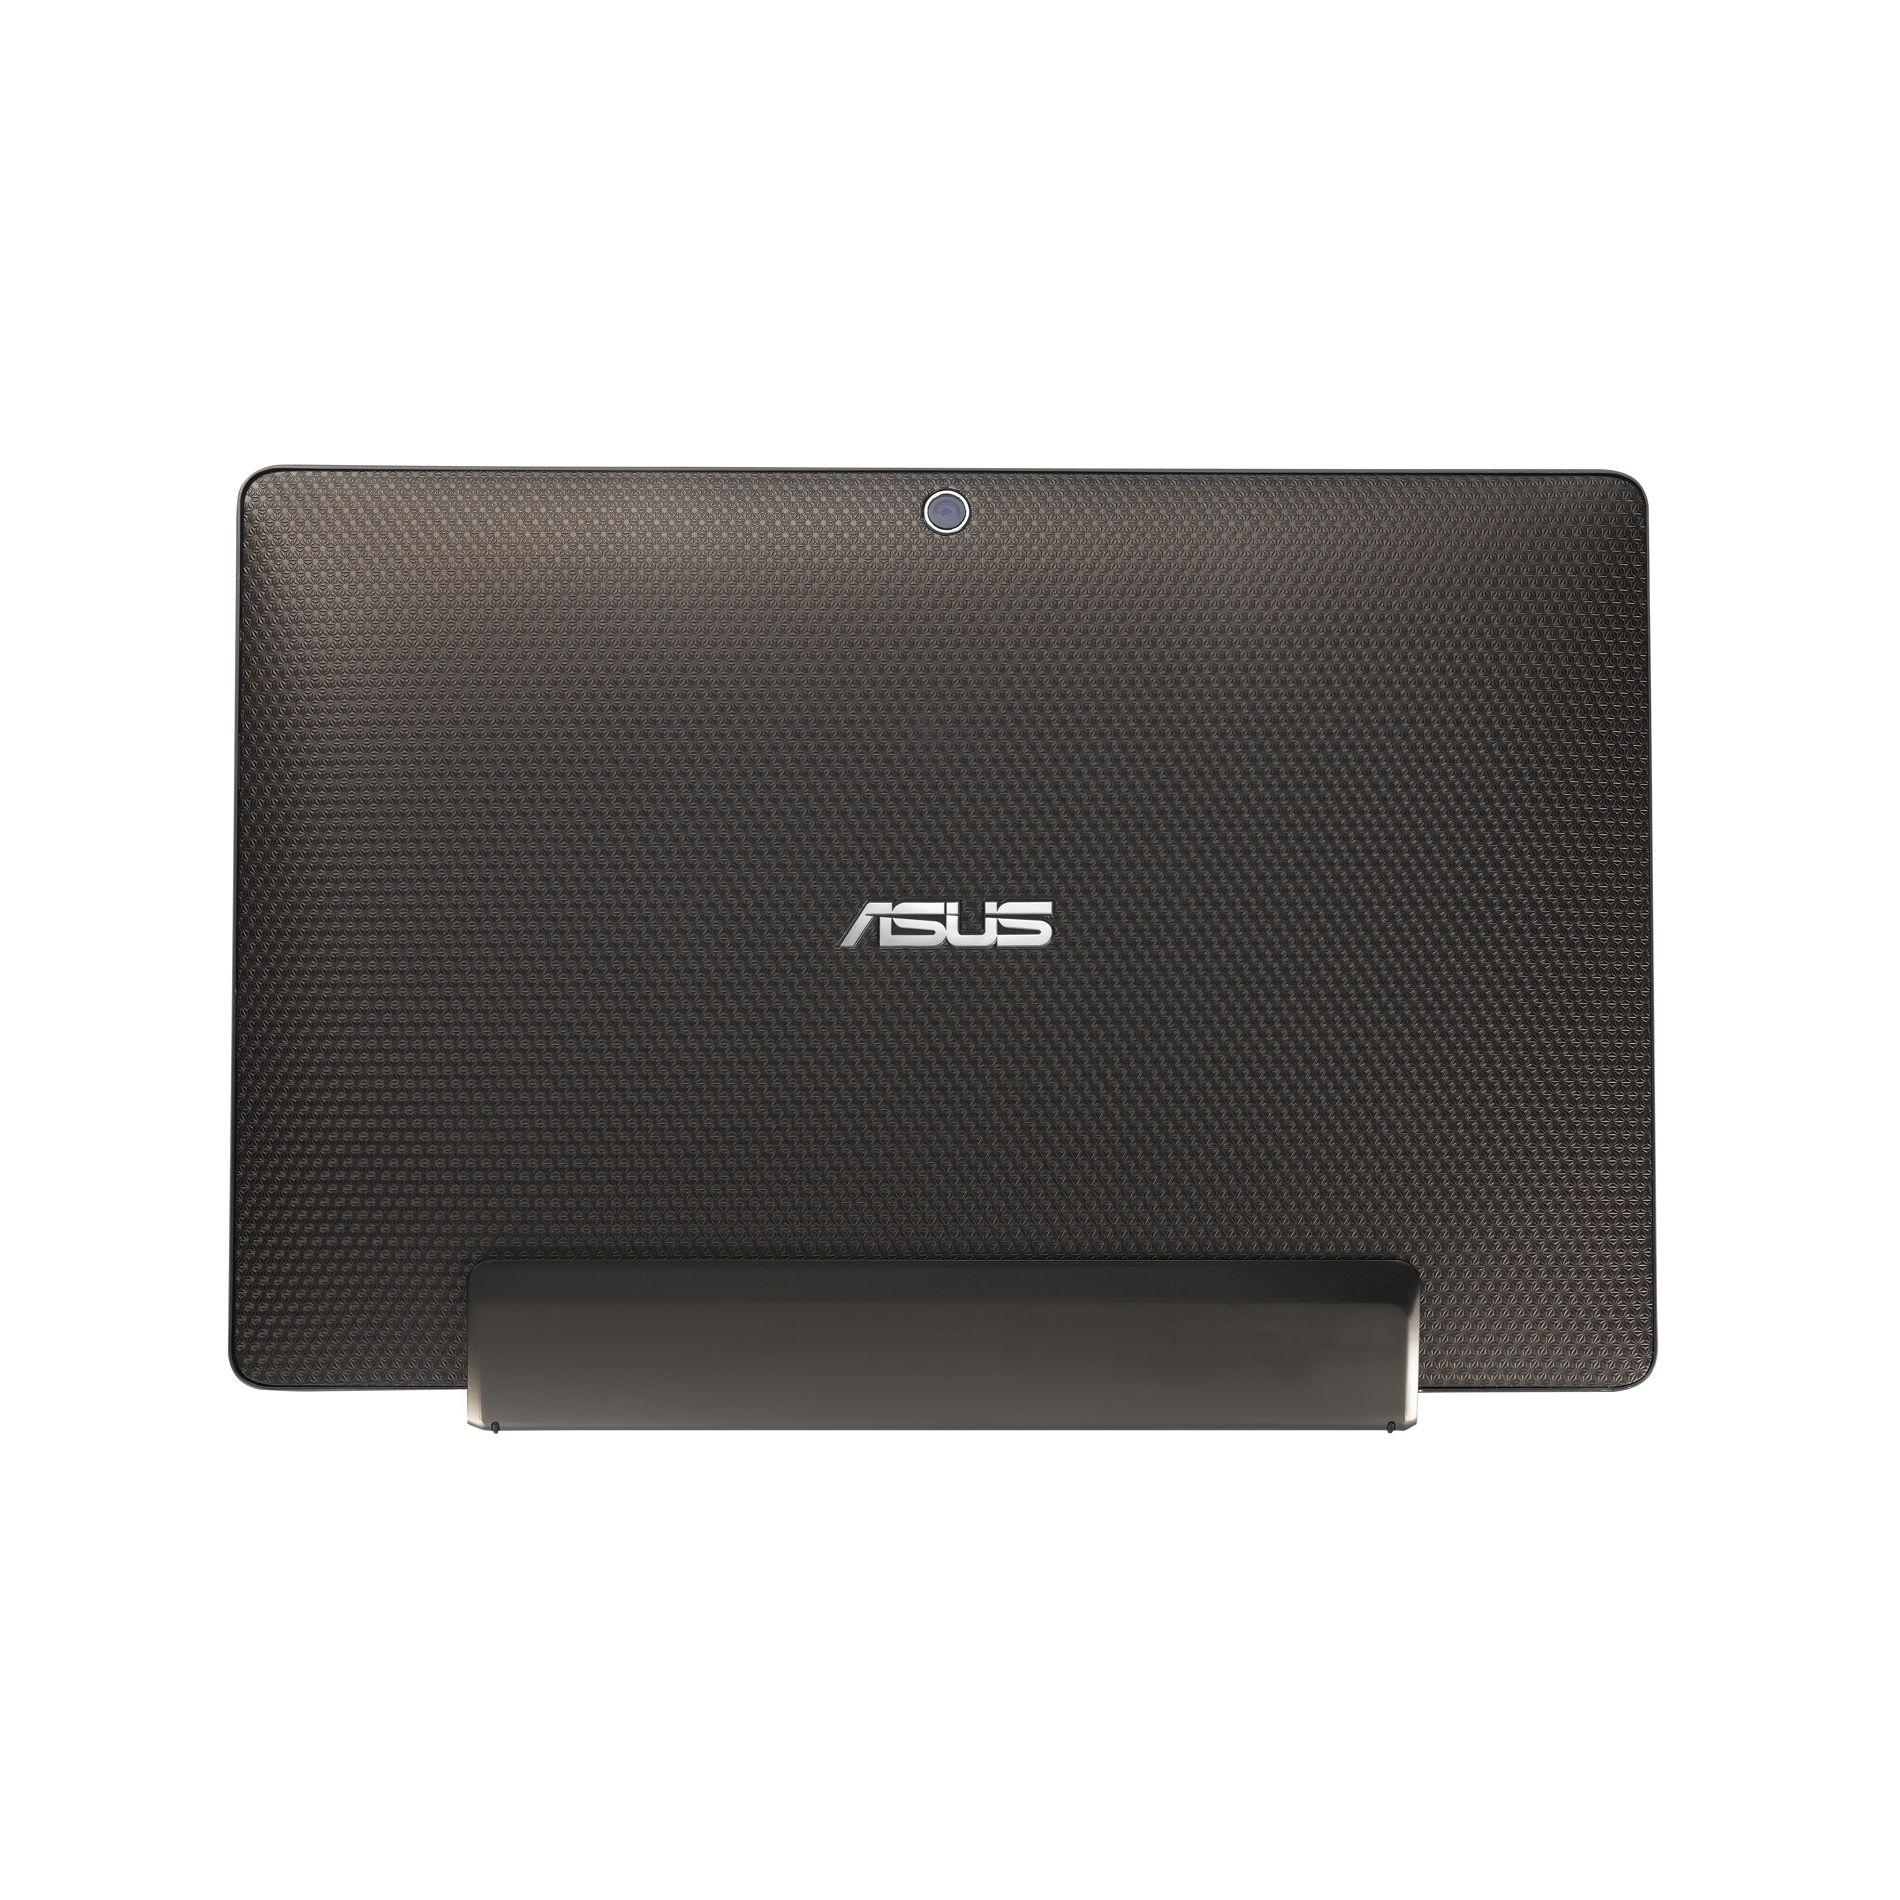 "Asus 10.1"" Tablet RTF101-A1"